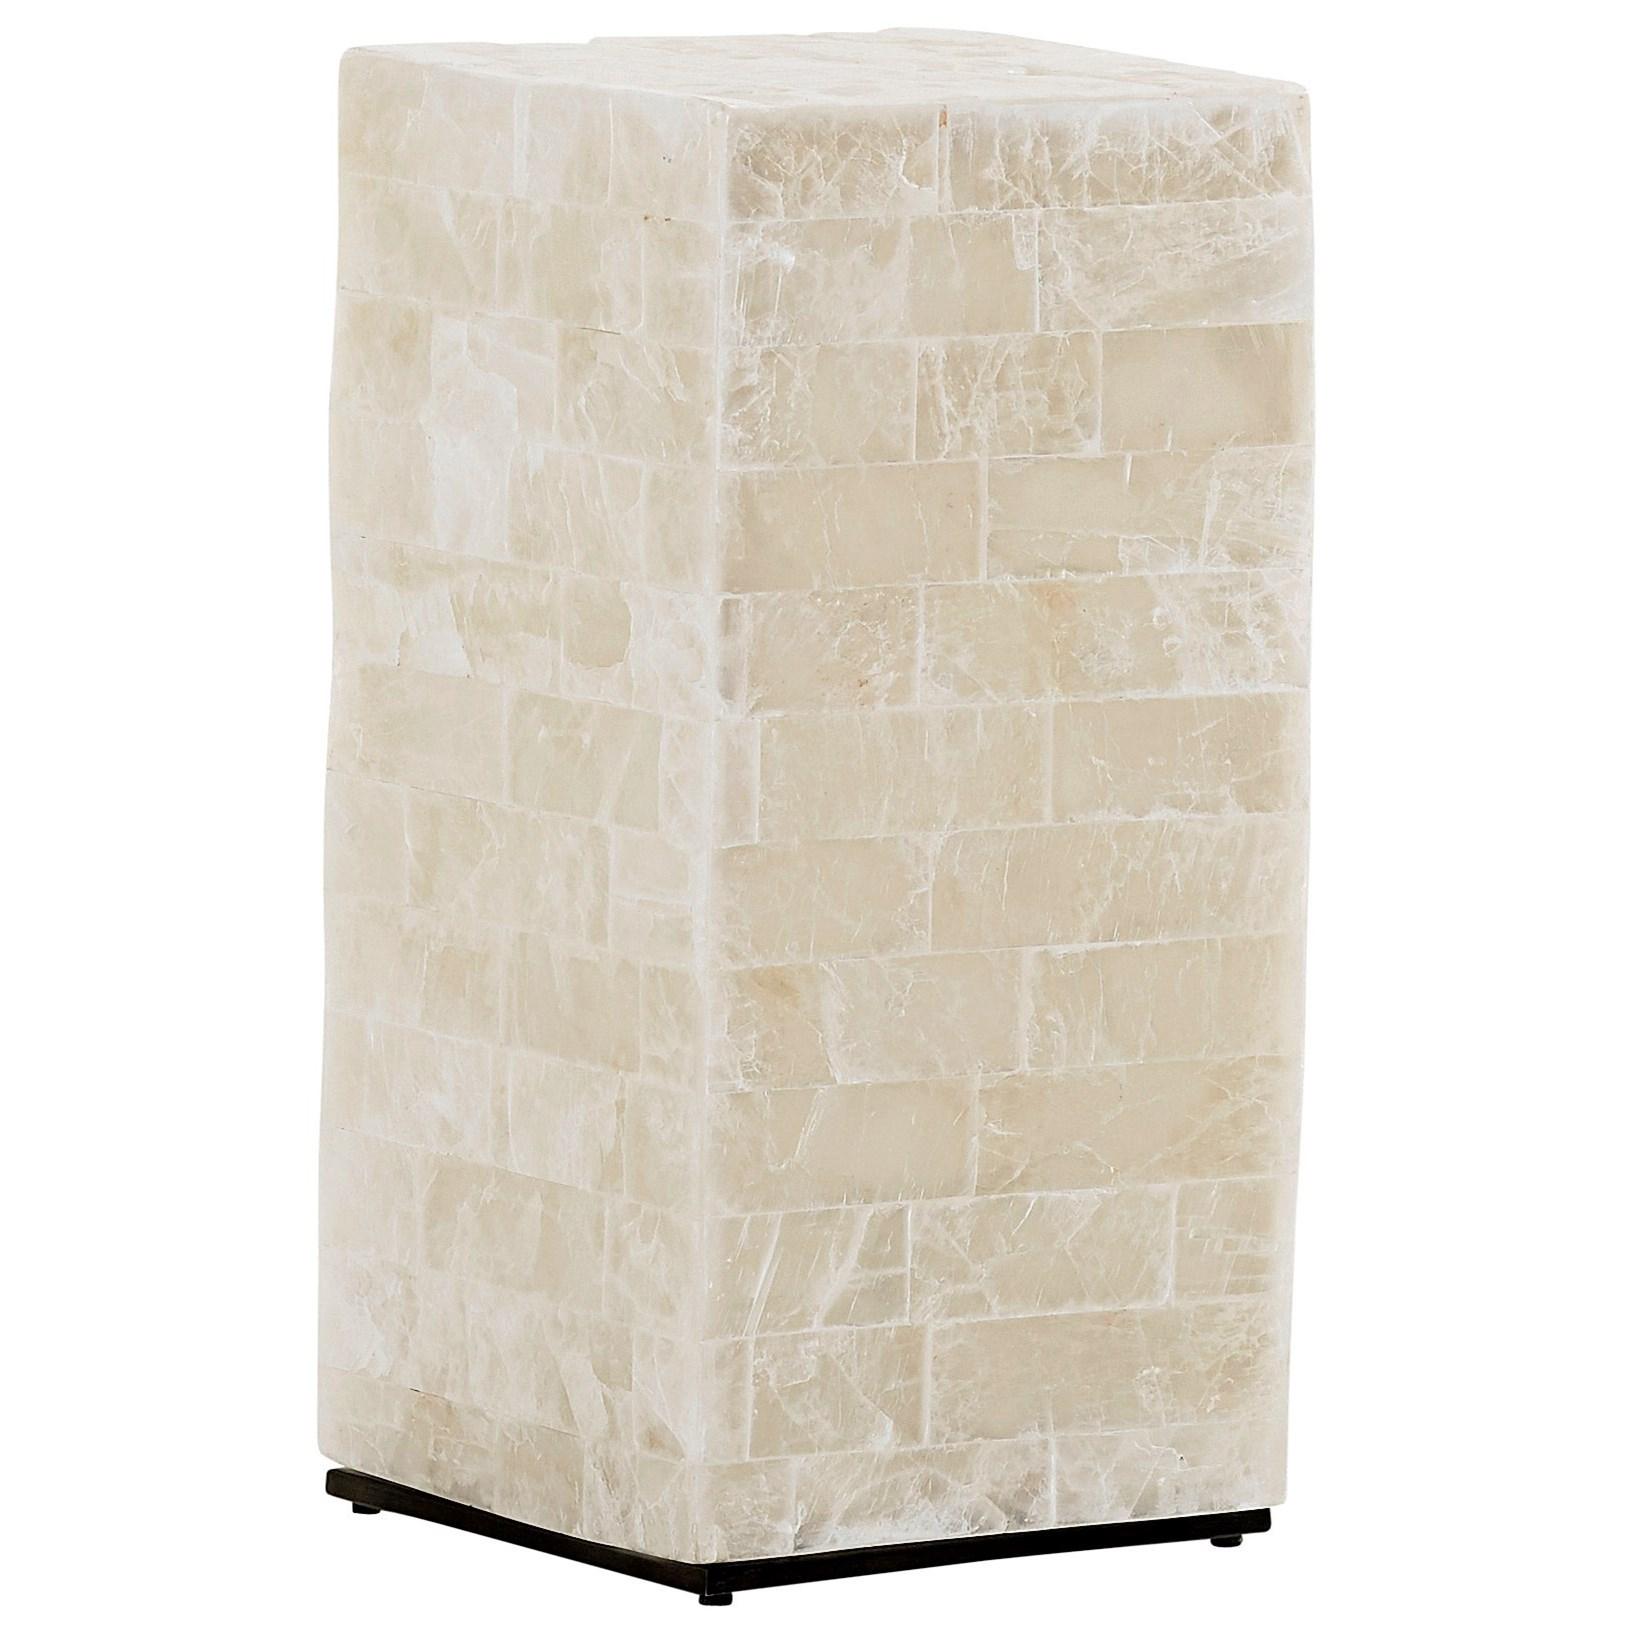 MacArthur Park Marisol Cube Table by Lexington at Baer's Furniture